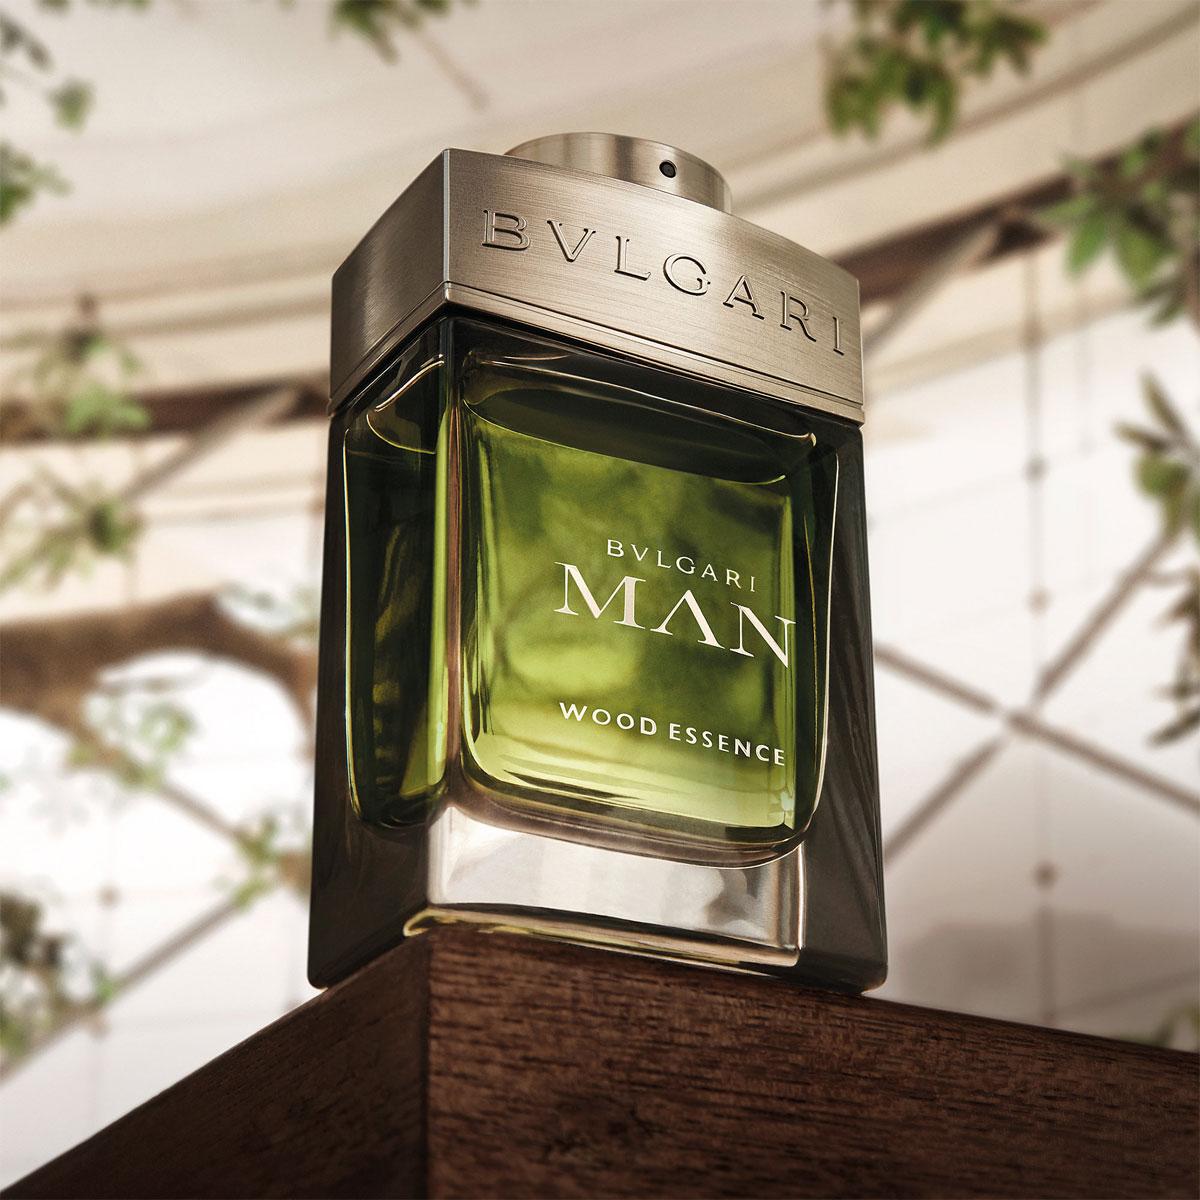 bvlgari-man-wood-essence perfume